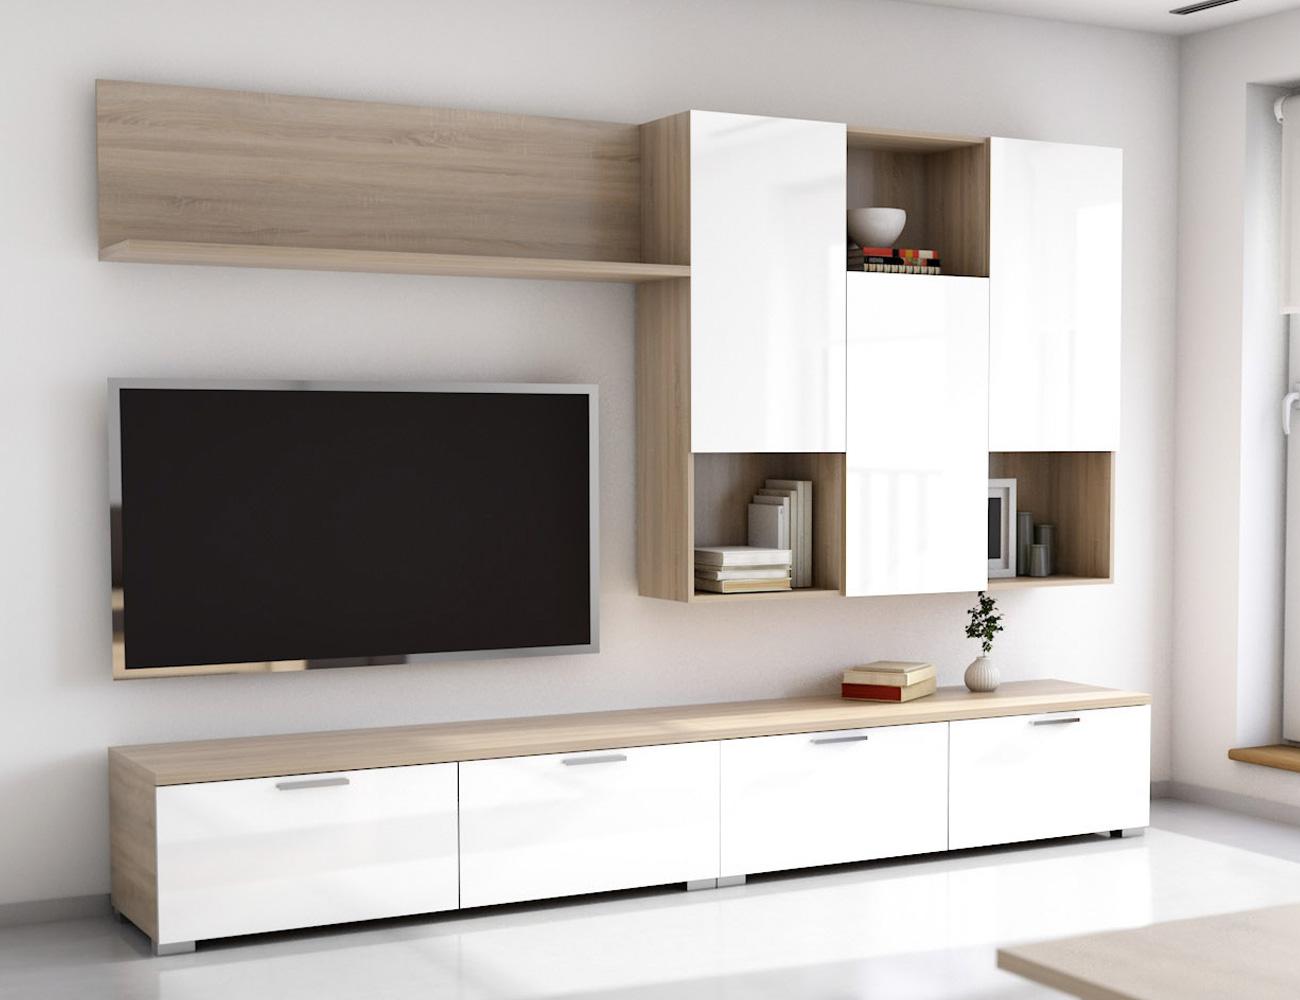 Mueble salon comedor 021 blanco